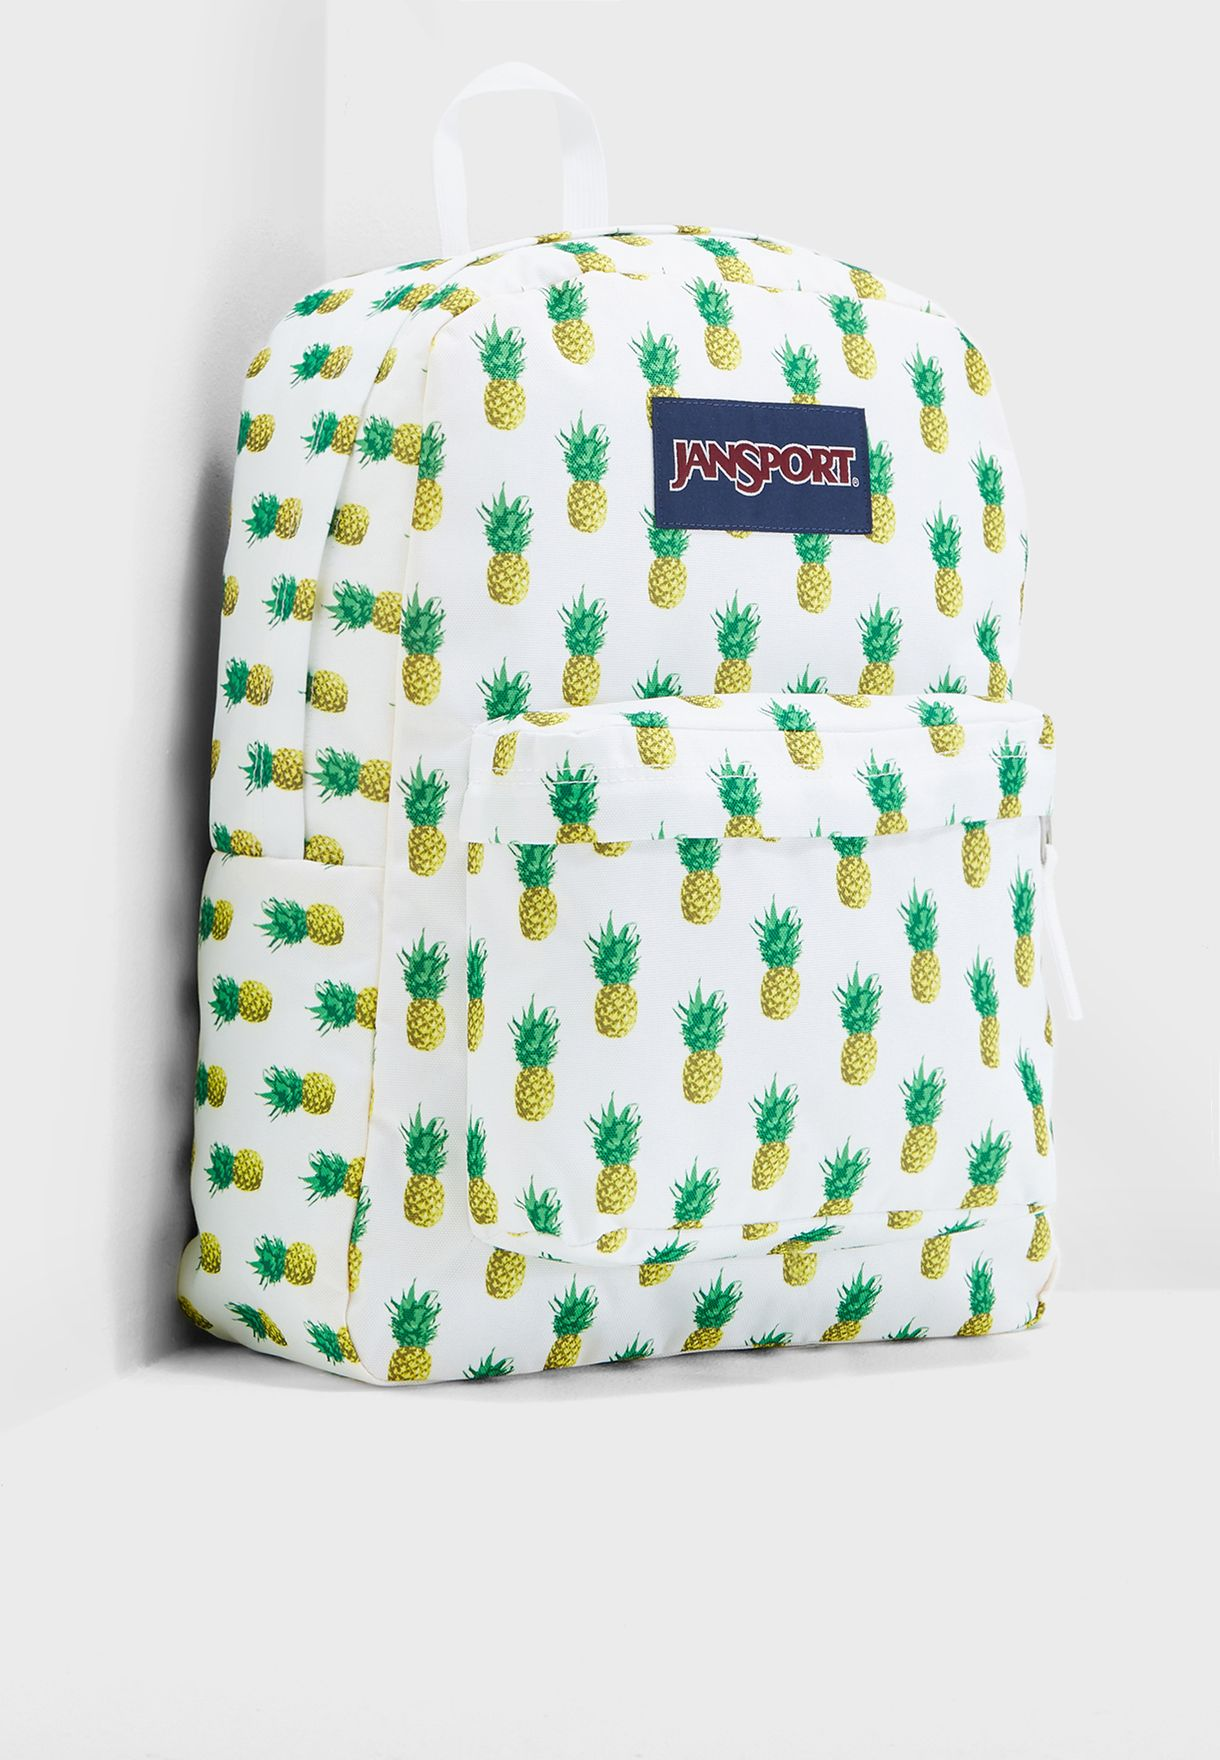 Jansport School Bags Nz c5025d5f497d2